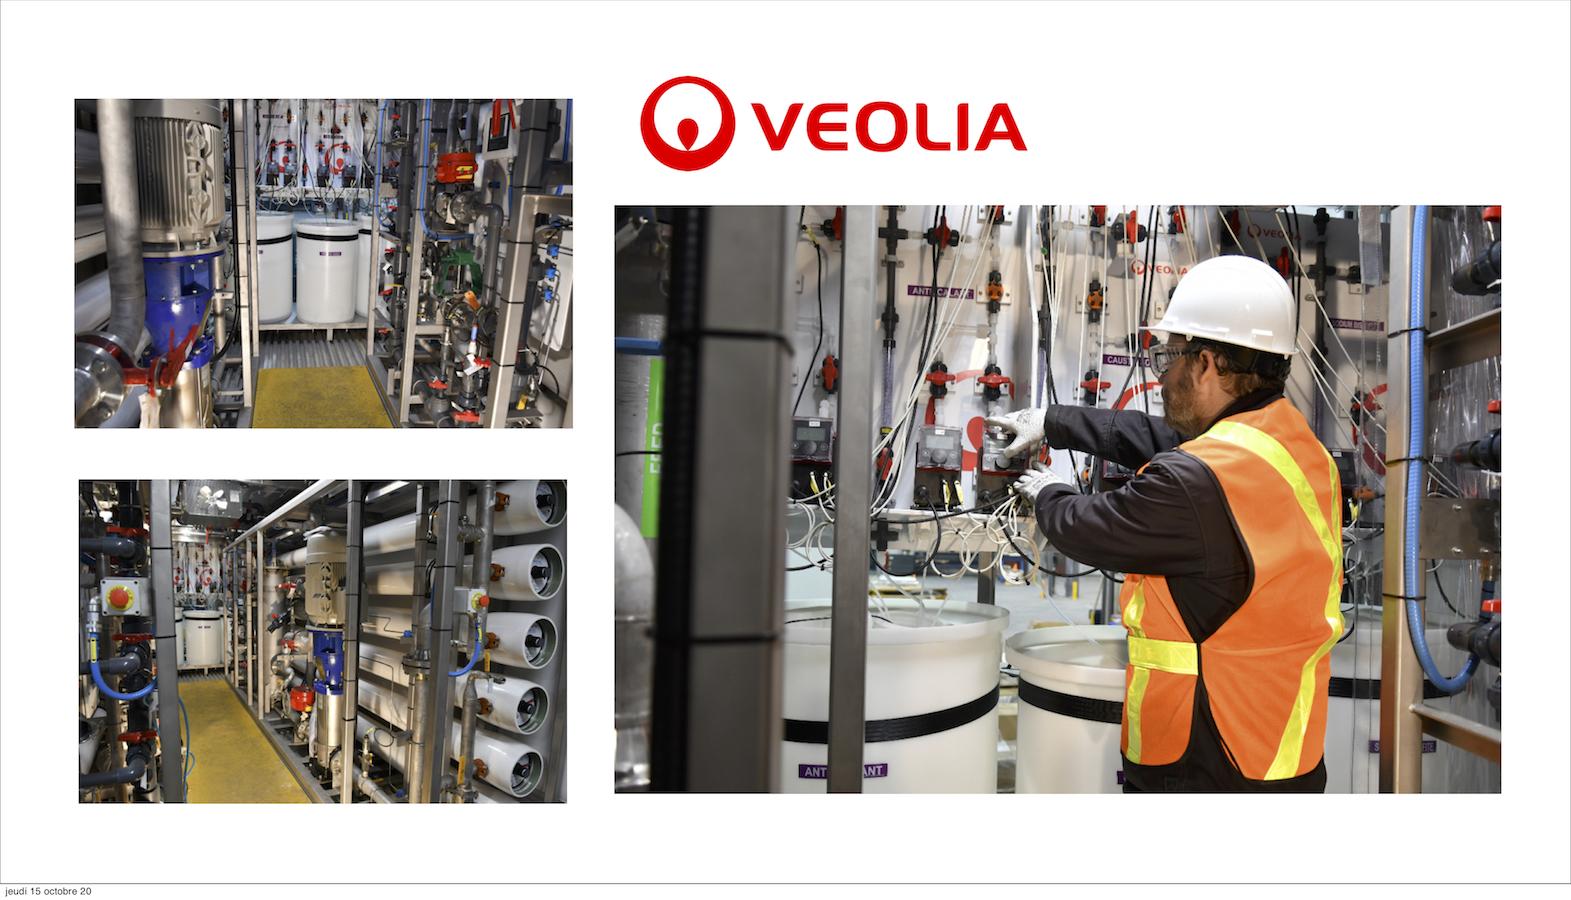 Veolia DemoPic (glissé(e)s) 2